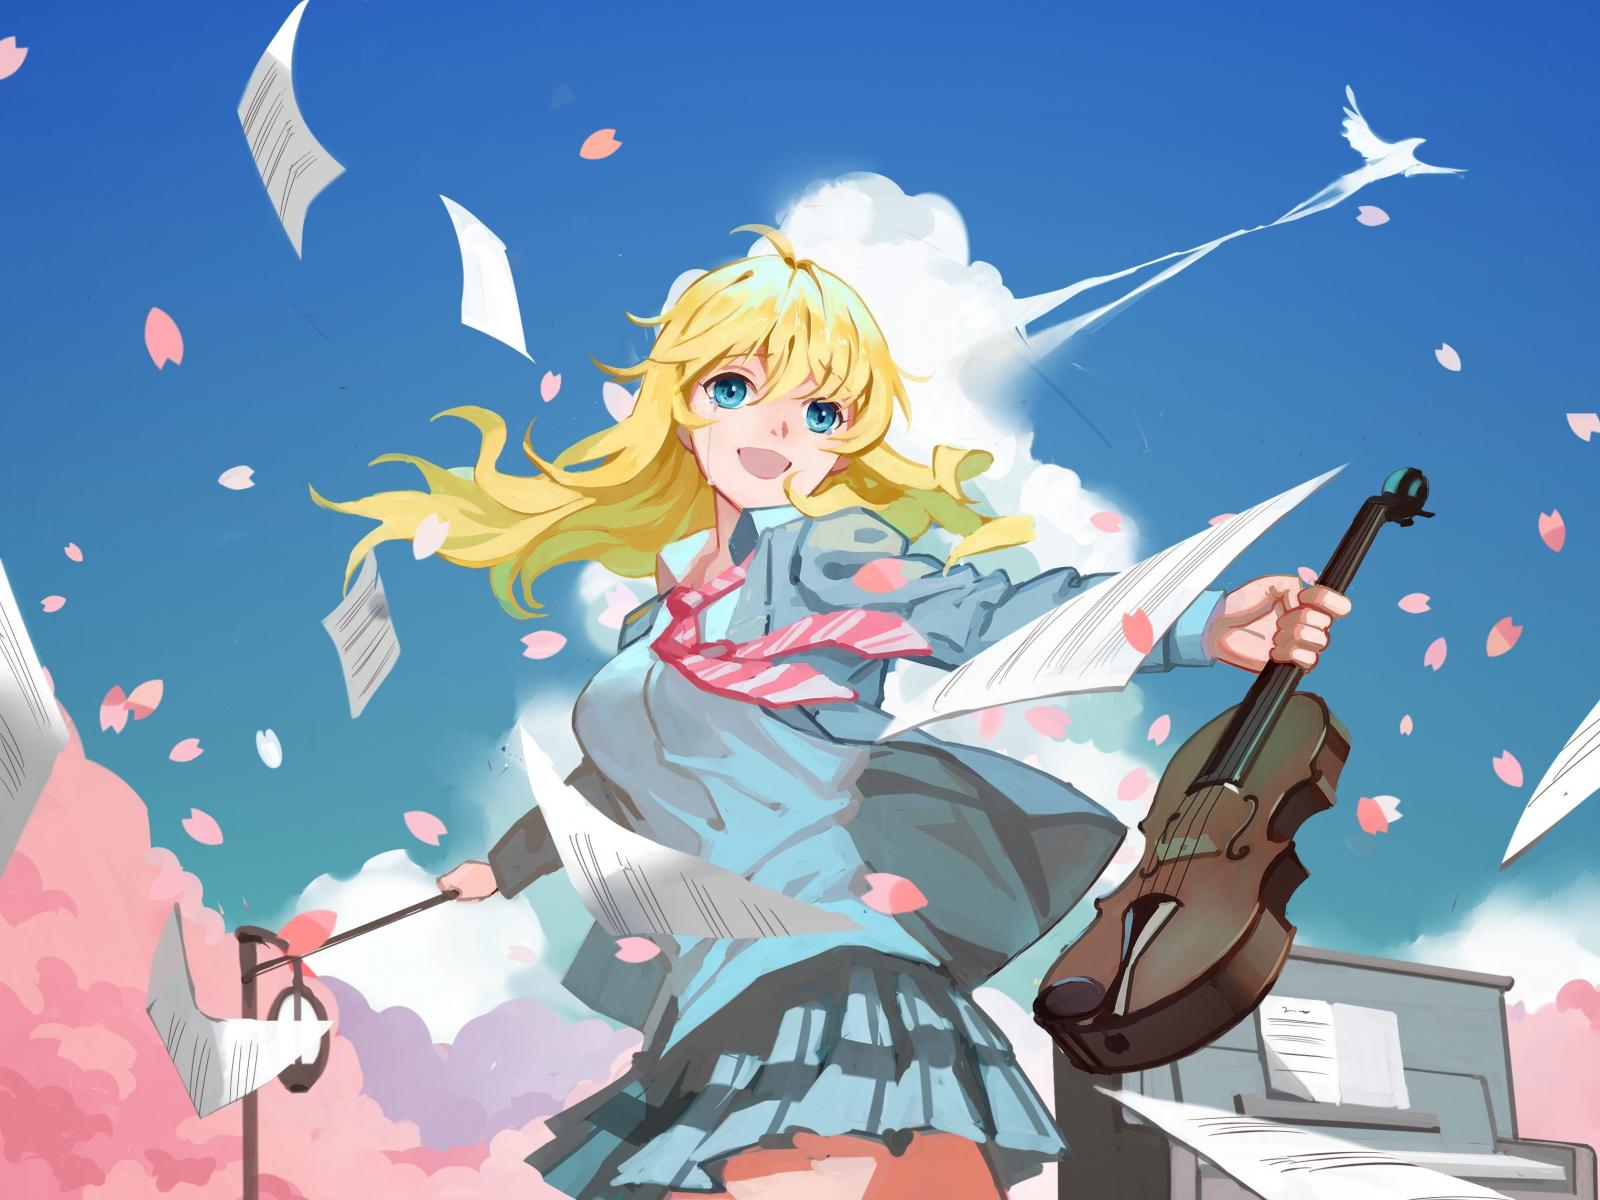 Download 1600x1200 Wallpaper Artwork Anime Girl Kaori